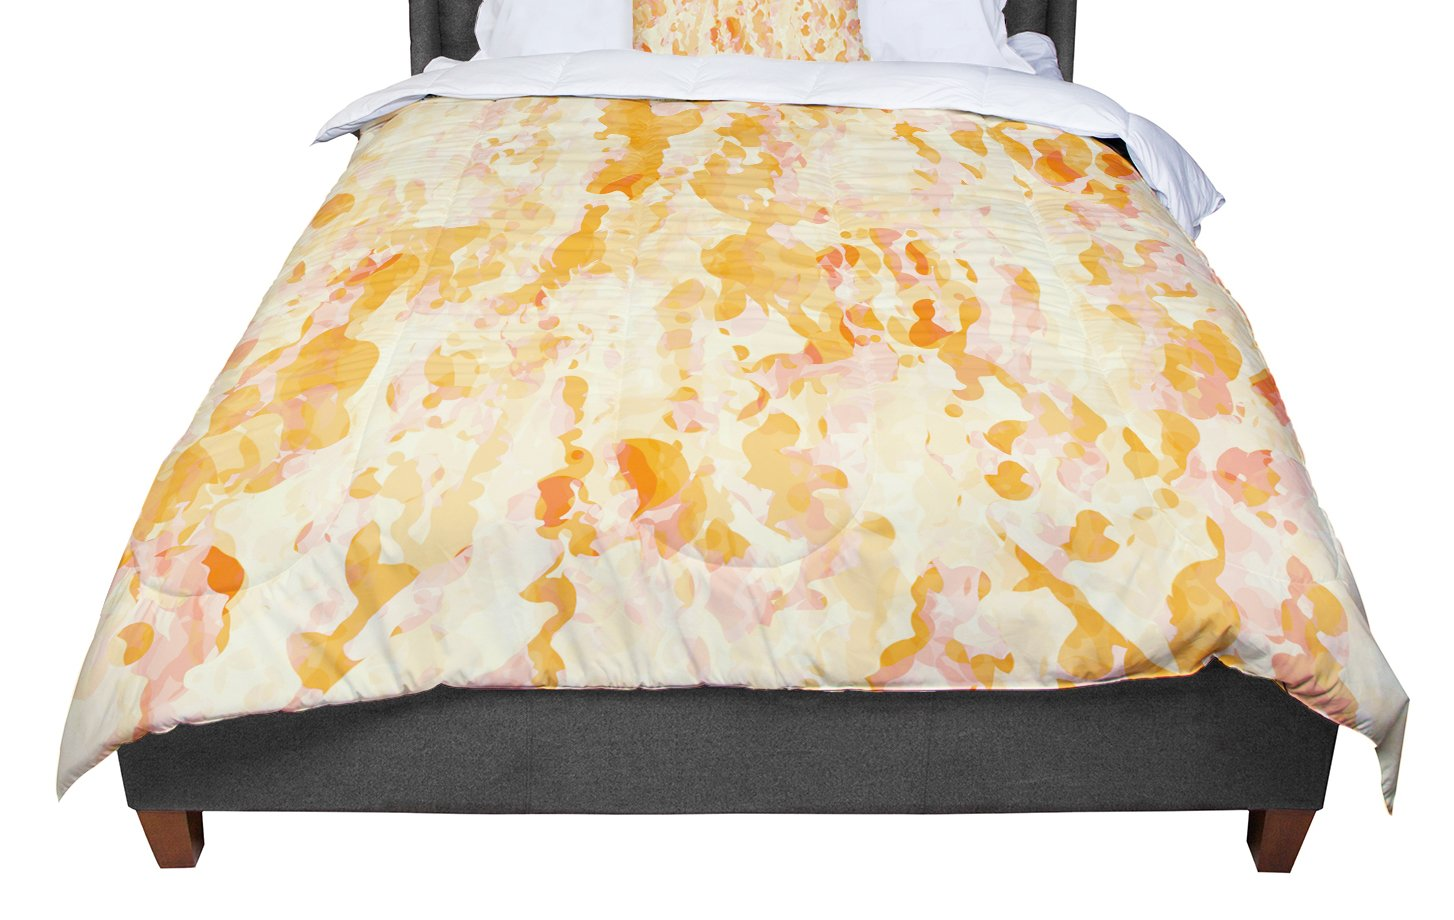 KESS InHouse CarolLynn Tice Explosion Orange Twin Comforter 68 X 88